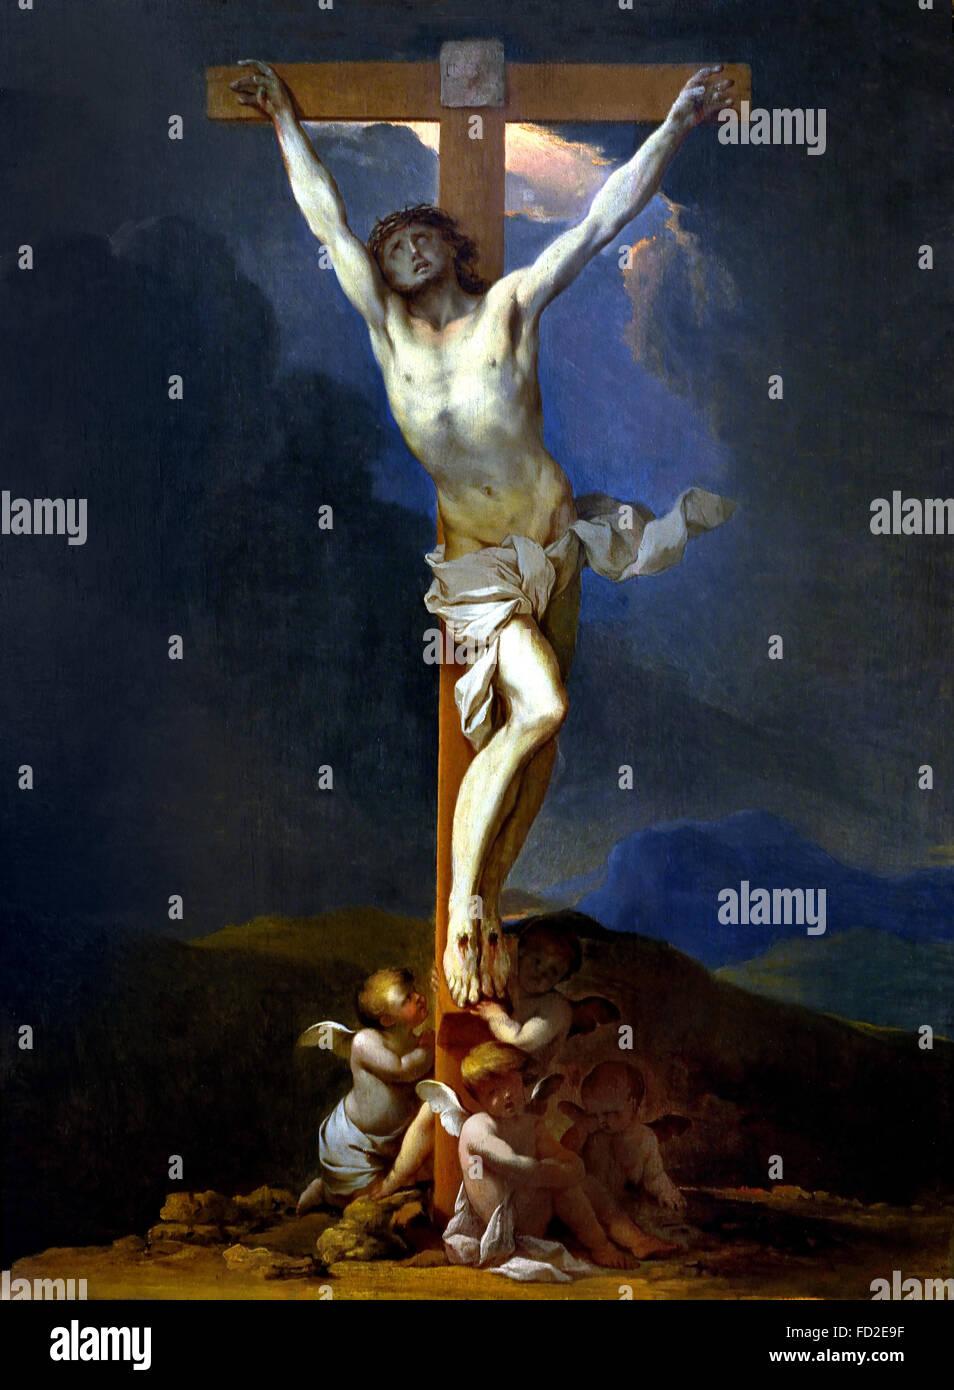 Le Christ en Croix  - Christ on the Cross 1640 Lubin Baugin 1610-1663 France French - Stock Image